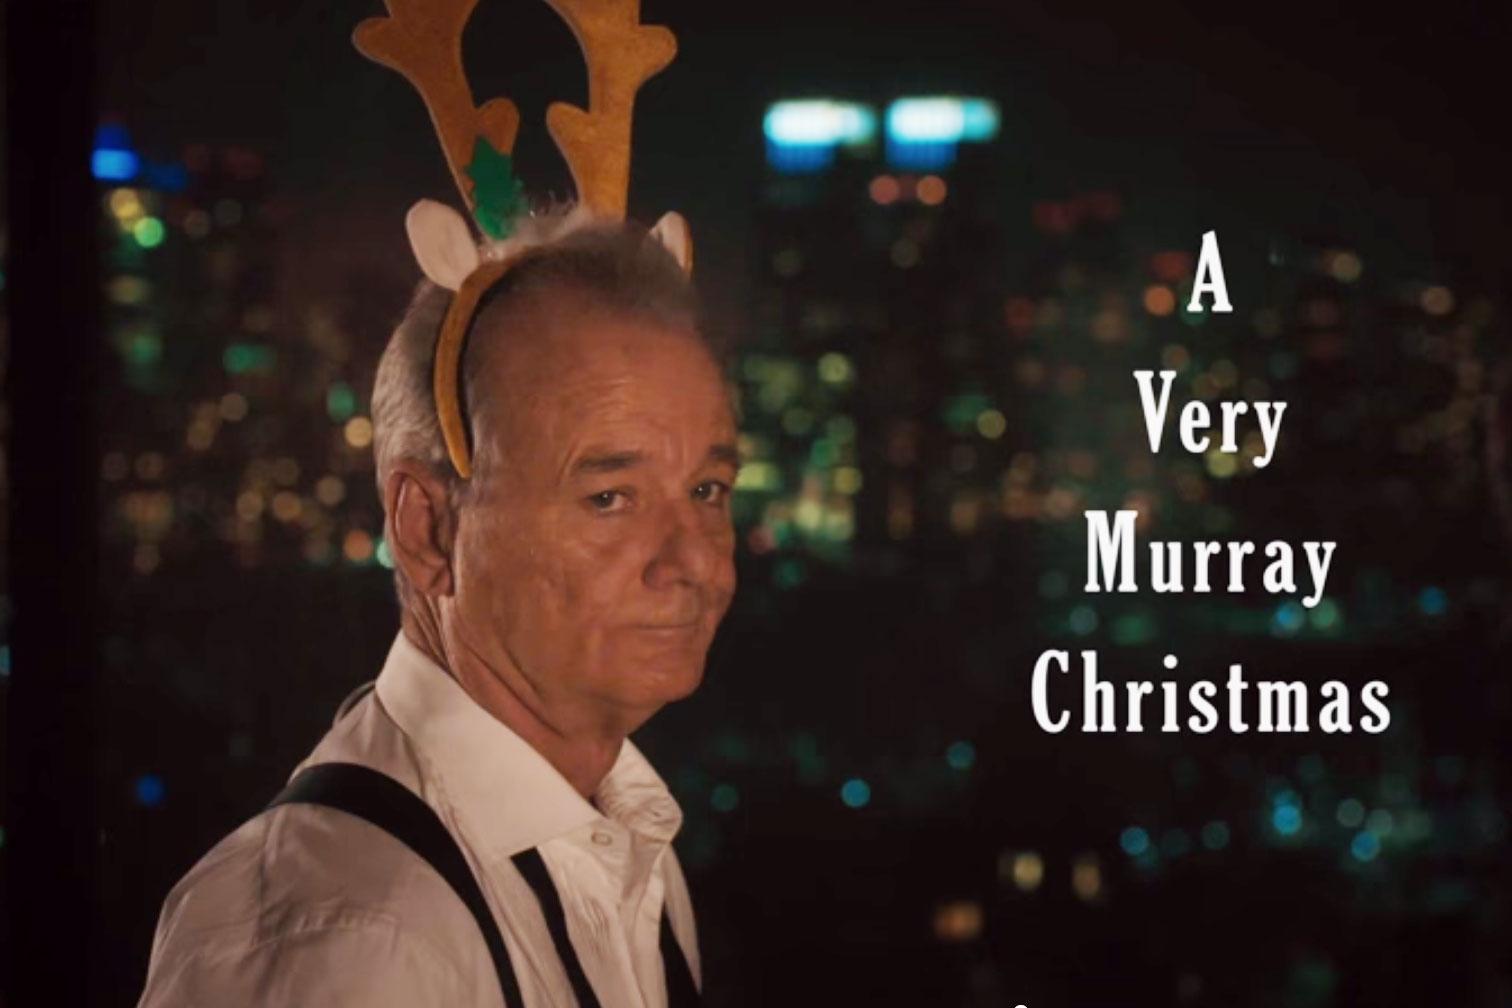 'A Very Murray Christmas' Teaser Trailer Starring Bill Murray